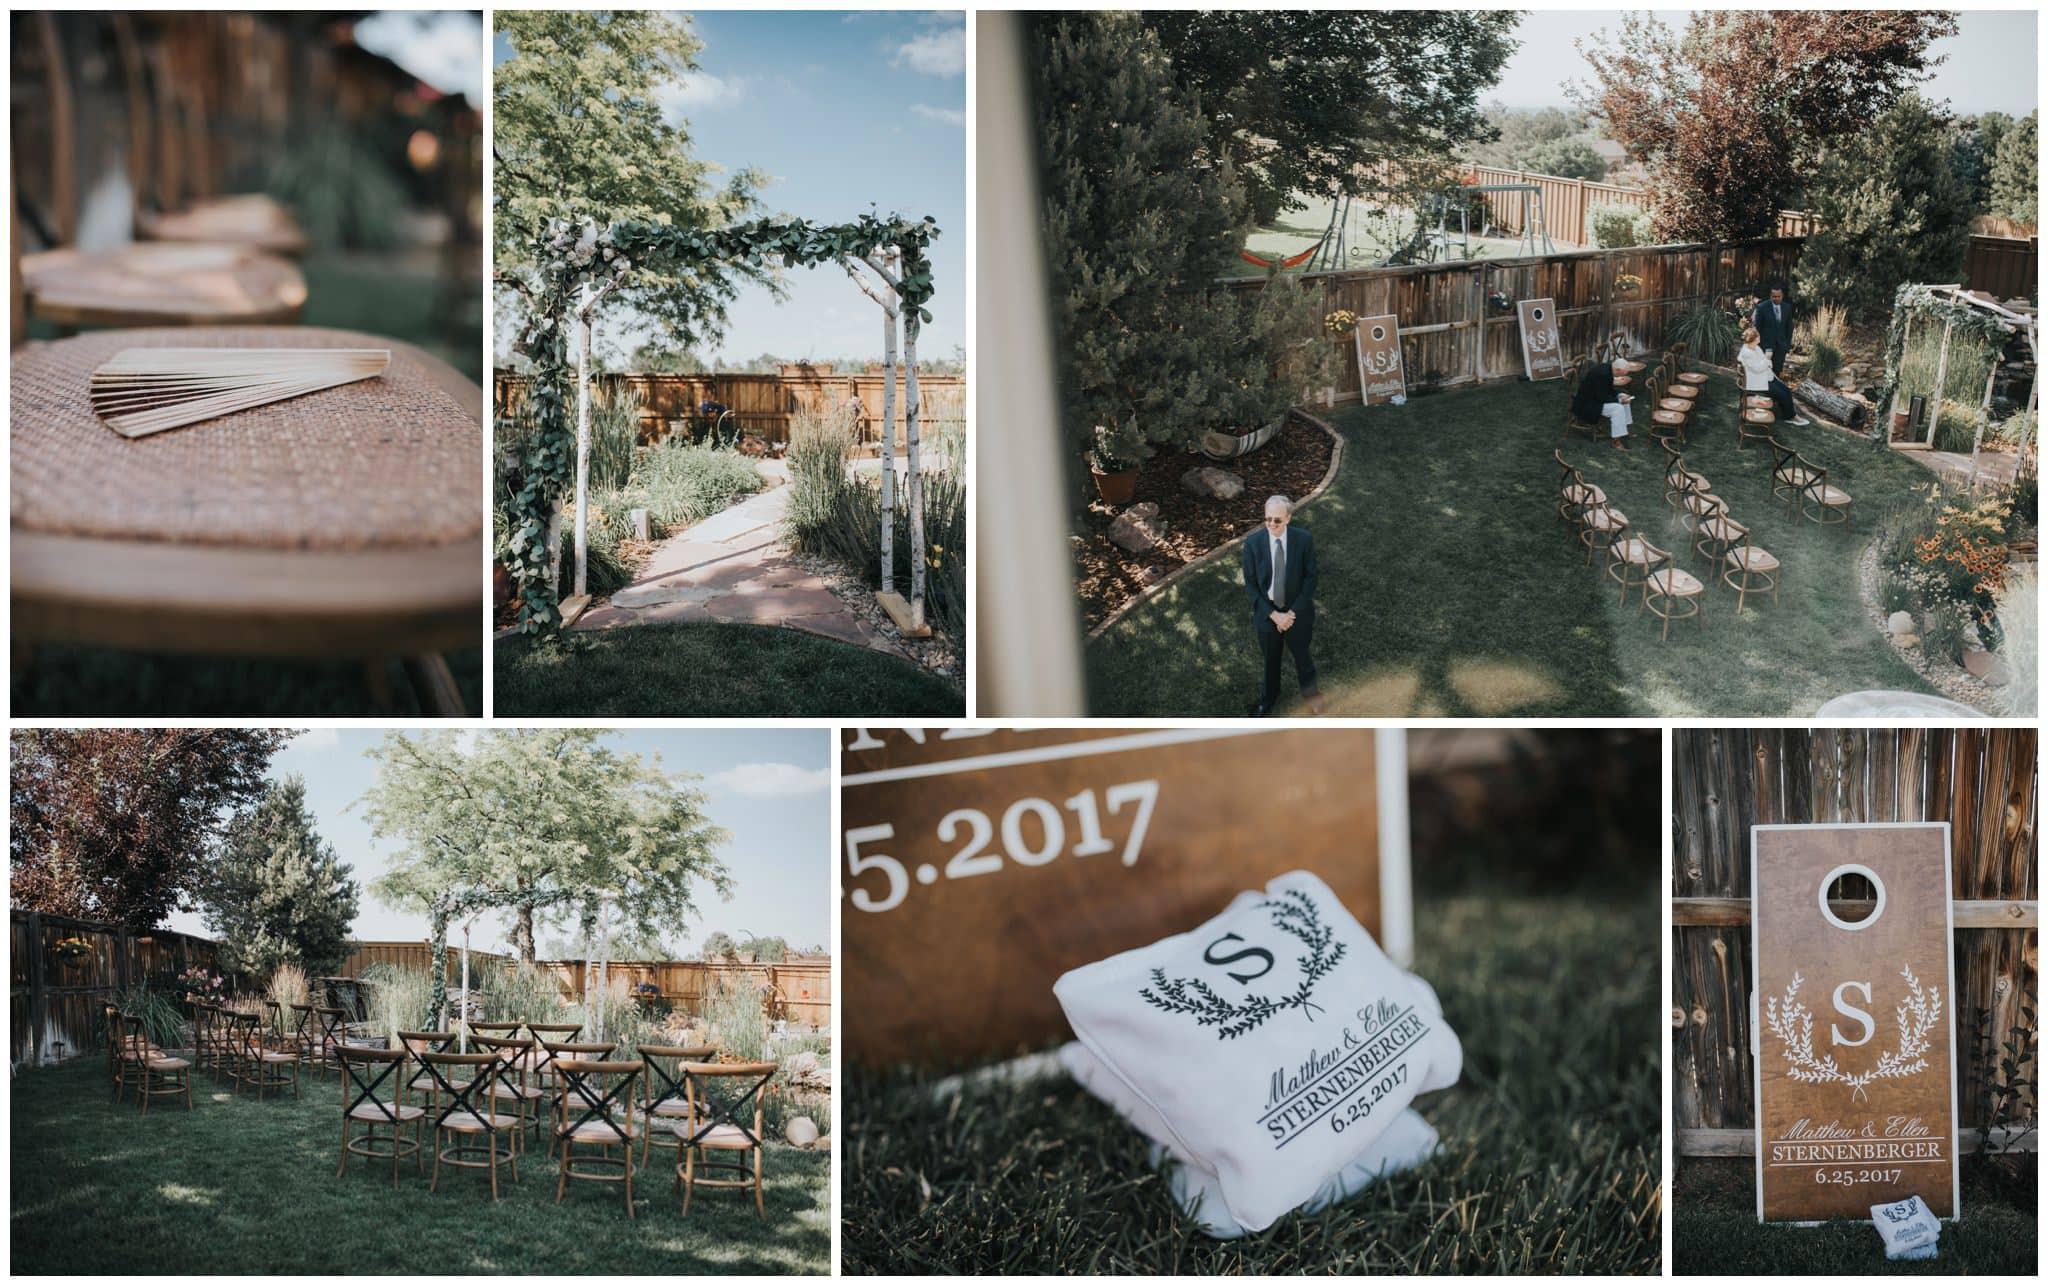 denver backyard wedding, bakyard wedding, backyard wedding photographer, denver wedding photographer, colorado wedding photographer, denver elopement, denver elopement photographer